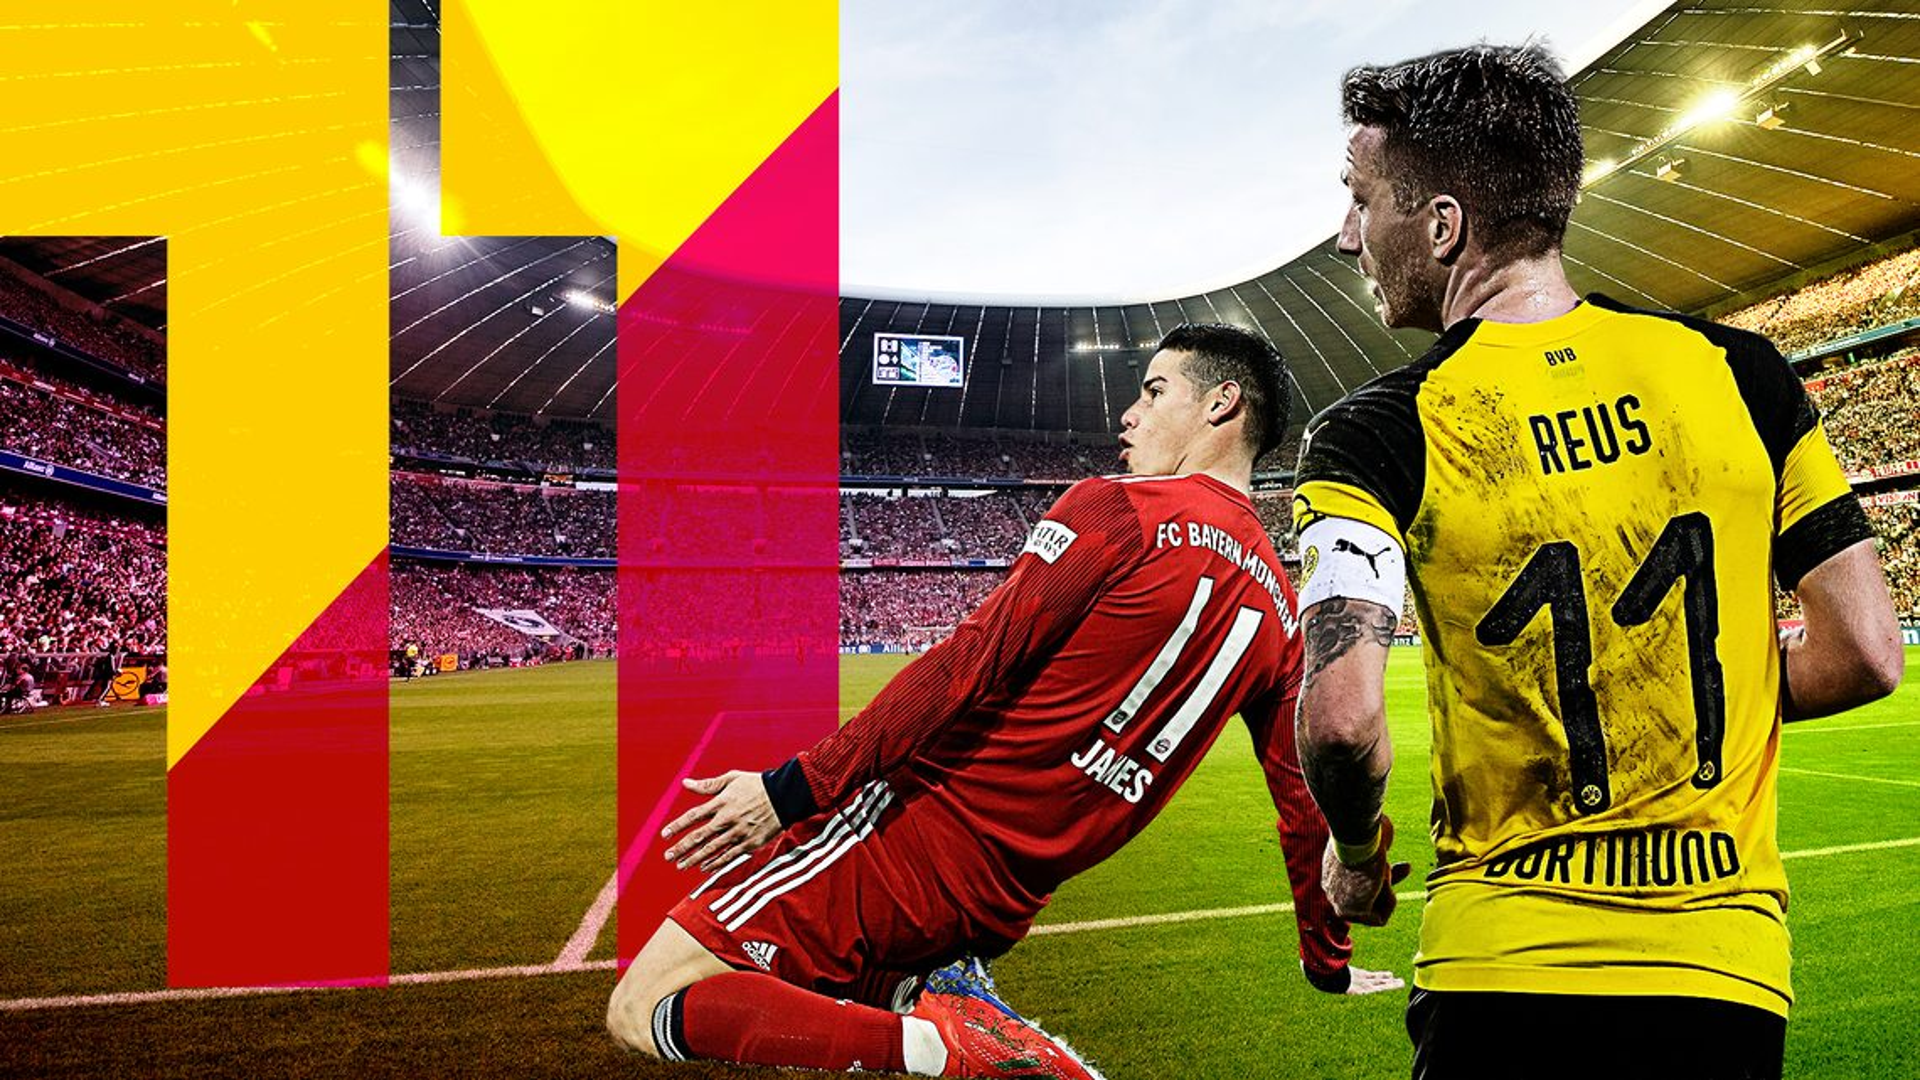 finest selection 6c575 28379 Bundesliga | James Rodriguez or Marco Reus? A combined ...